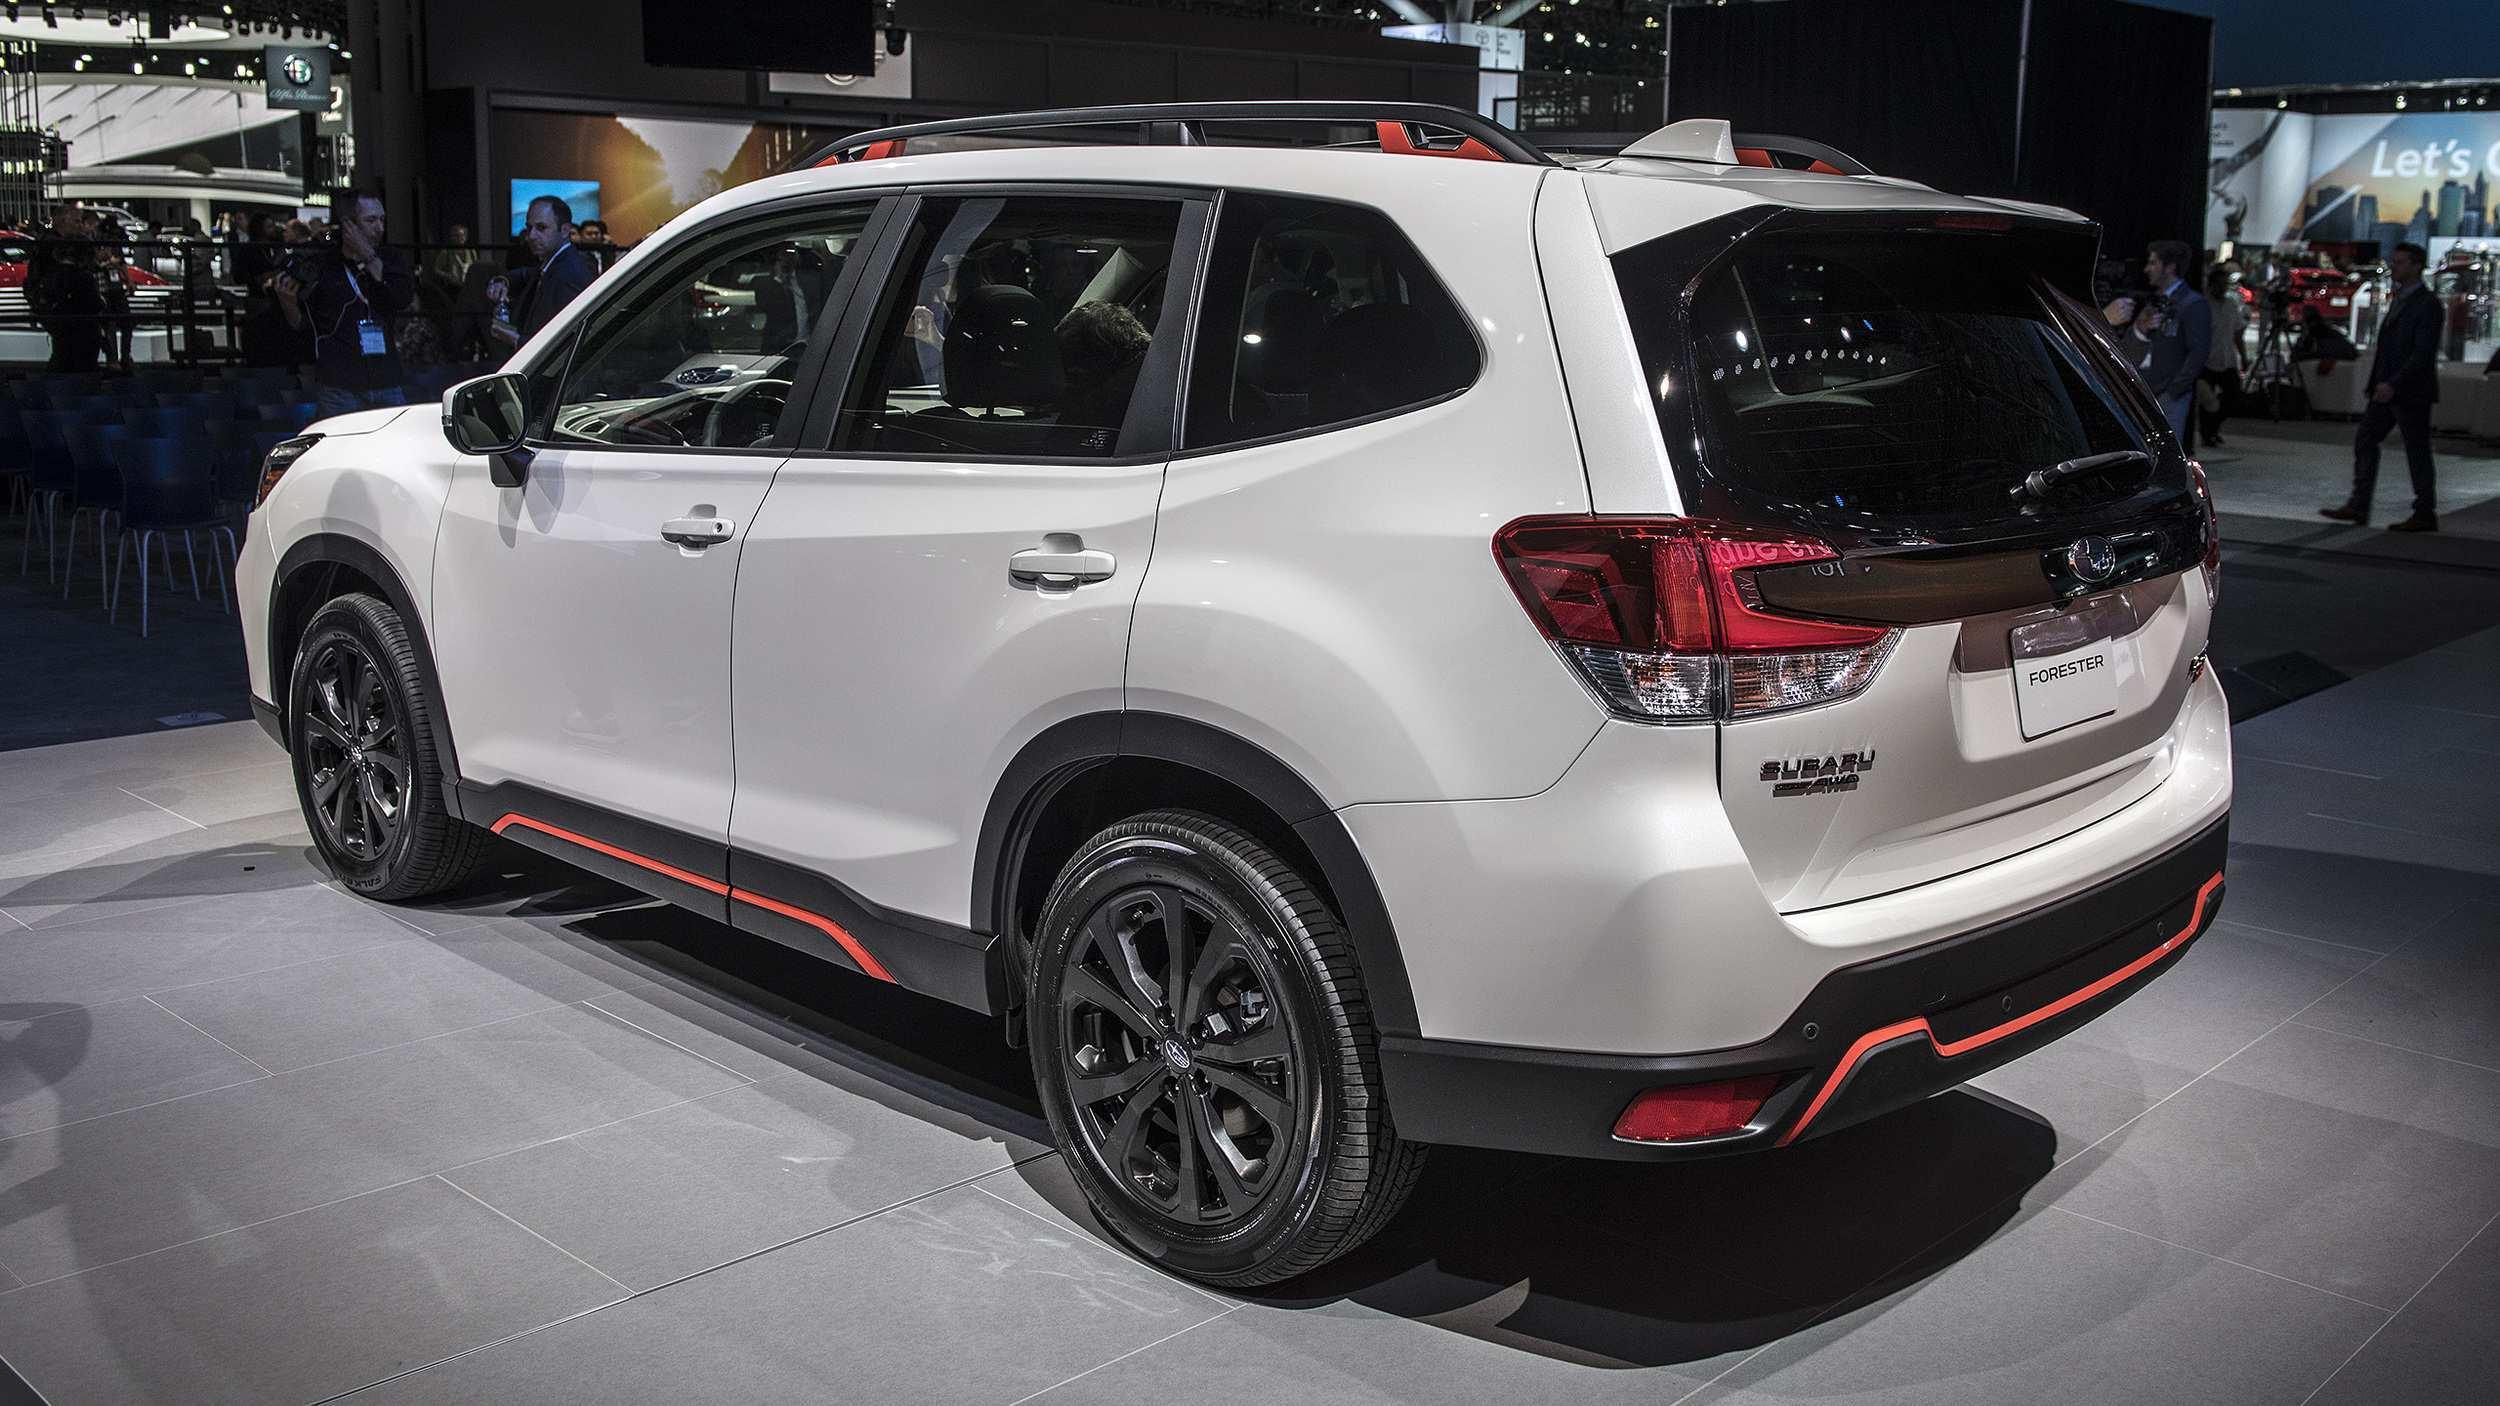 54 Gallery of Subaru Sport 2019 Review with Subaru Sport 2019